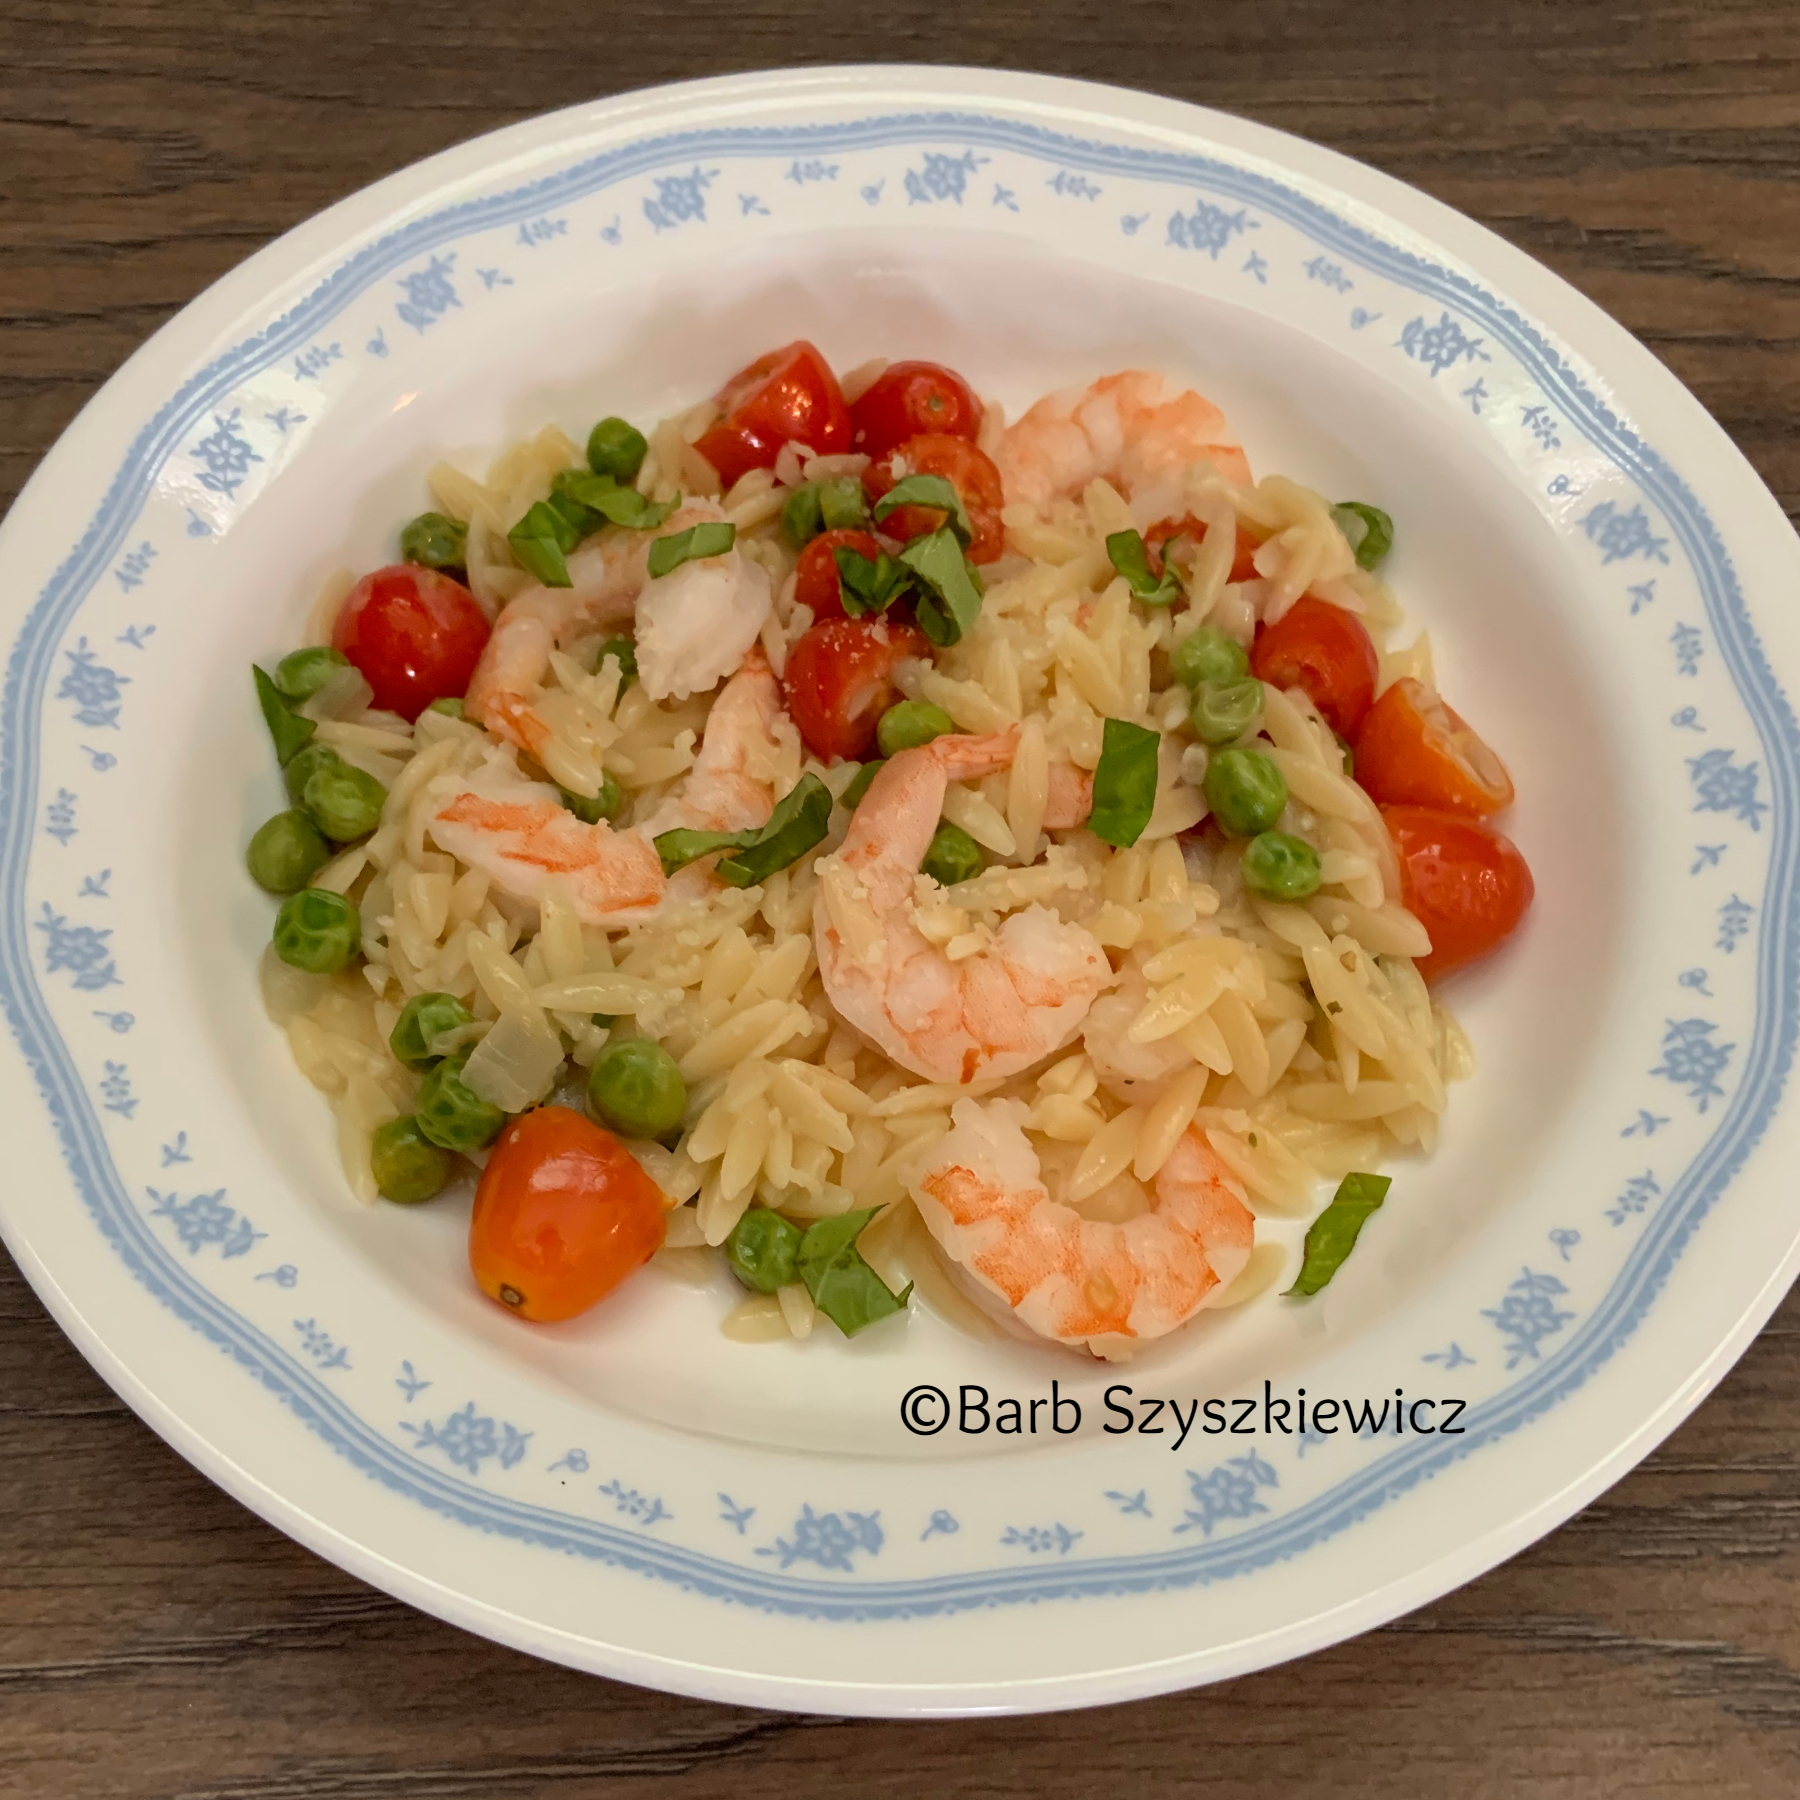 orzo with shrimp and vegetables-bszyszkiewicz-0115 2